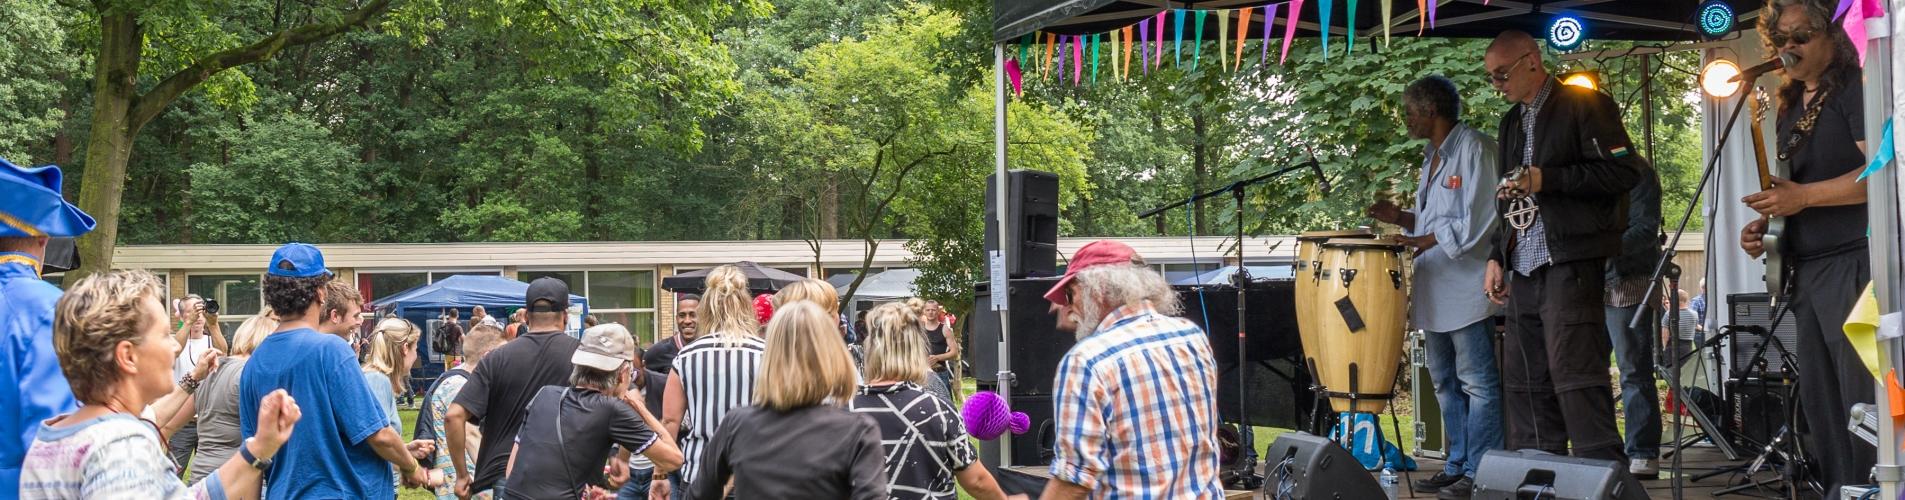 Zingevingsfestival - 16 juni 2020